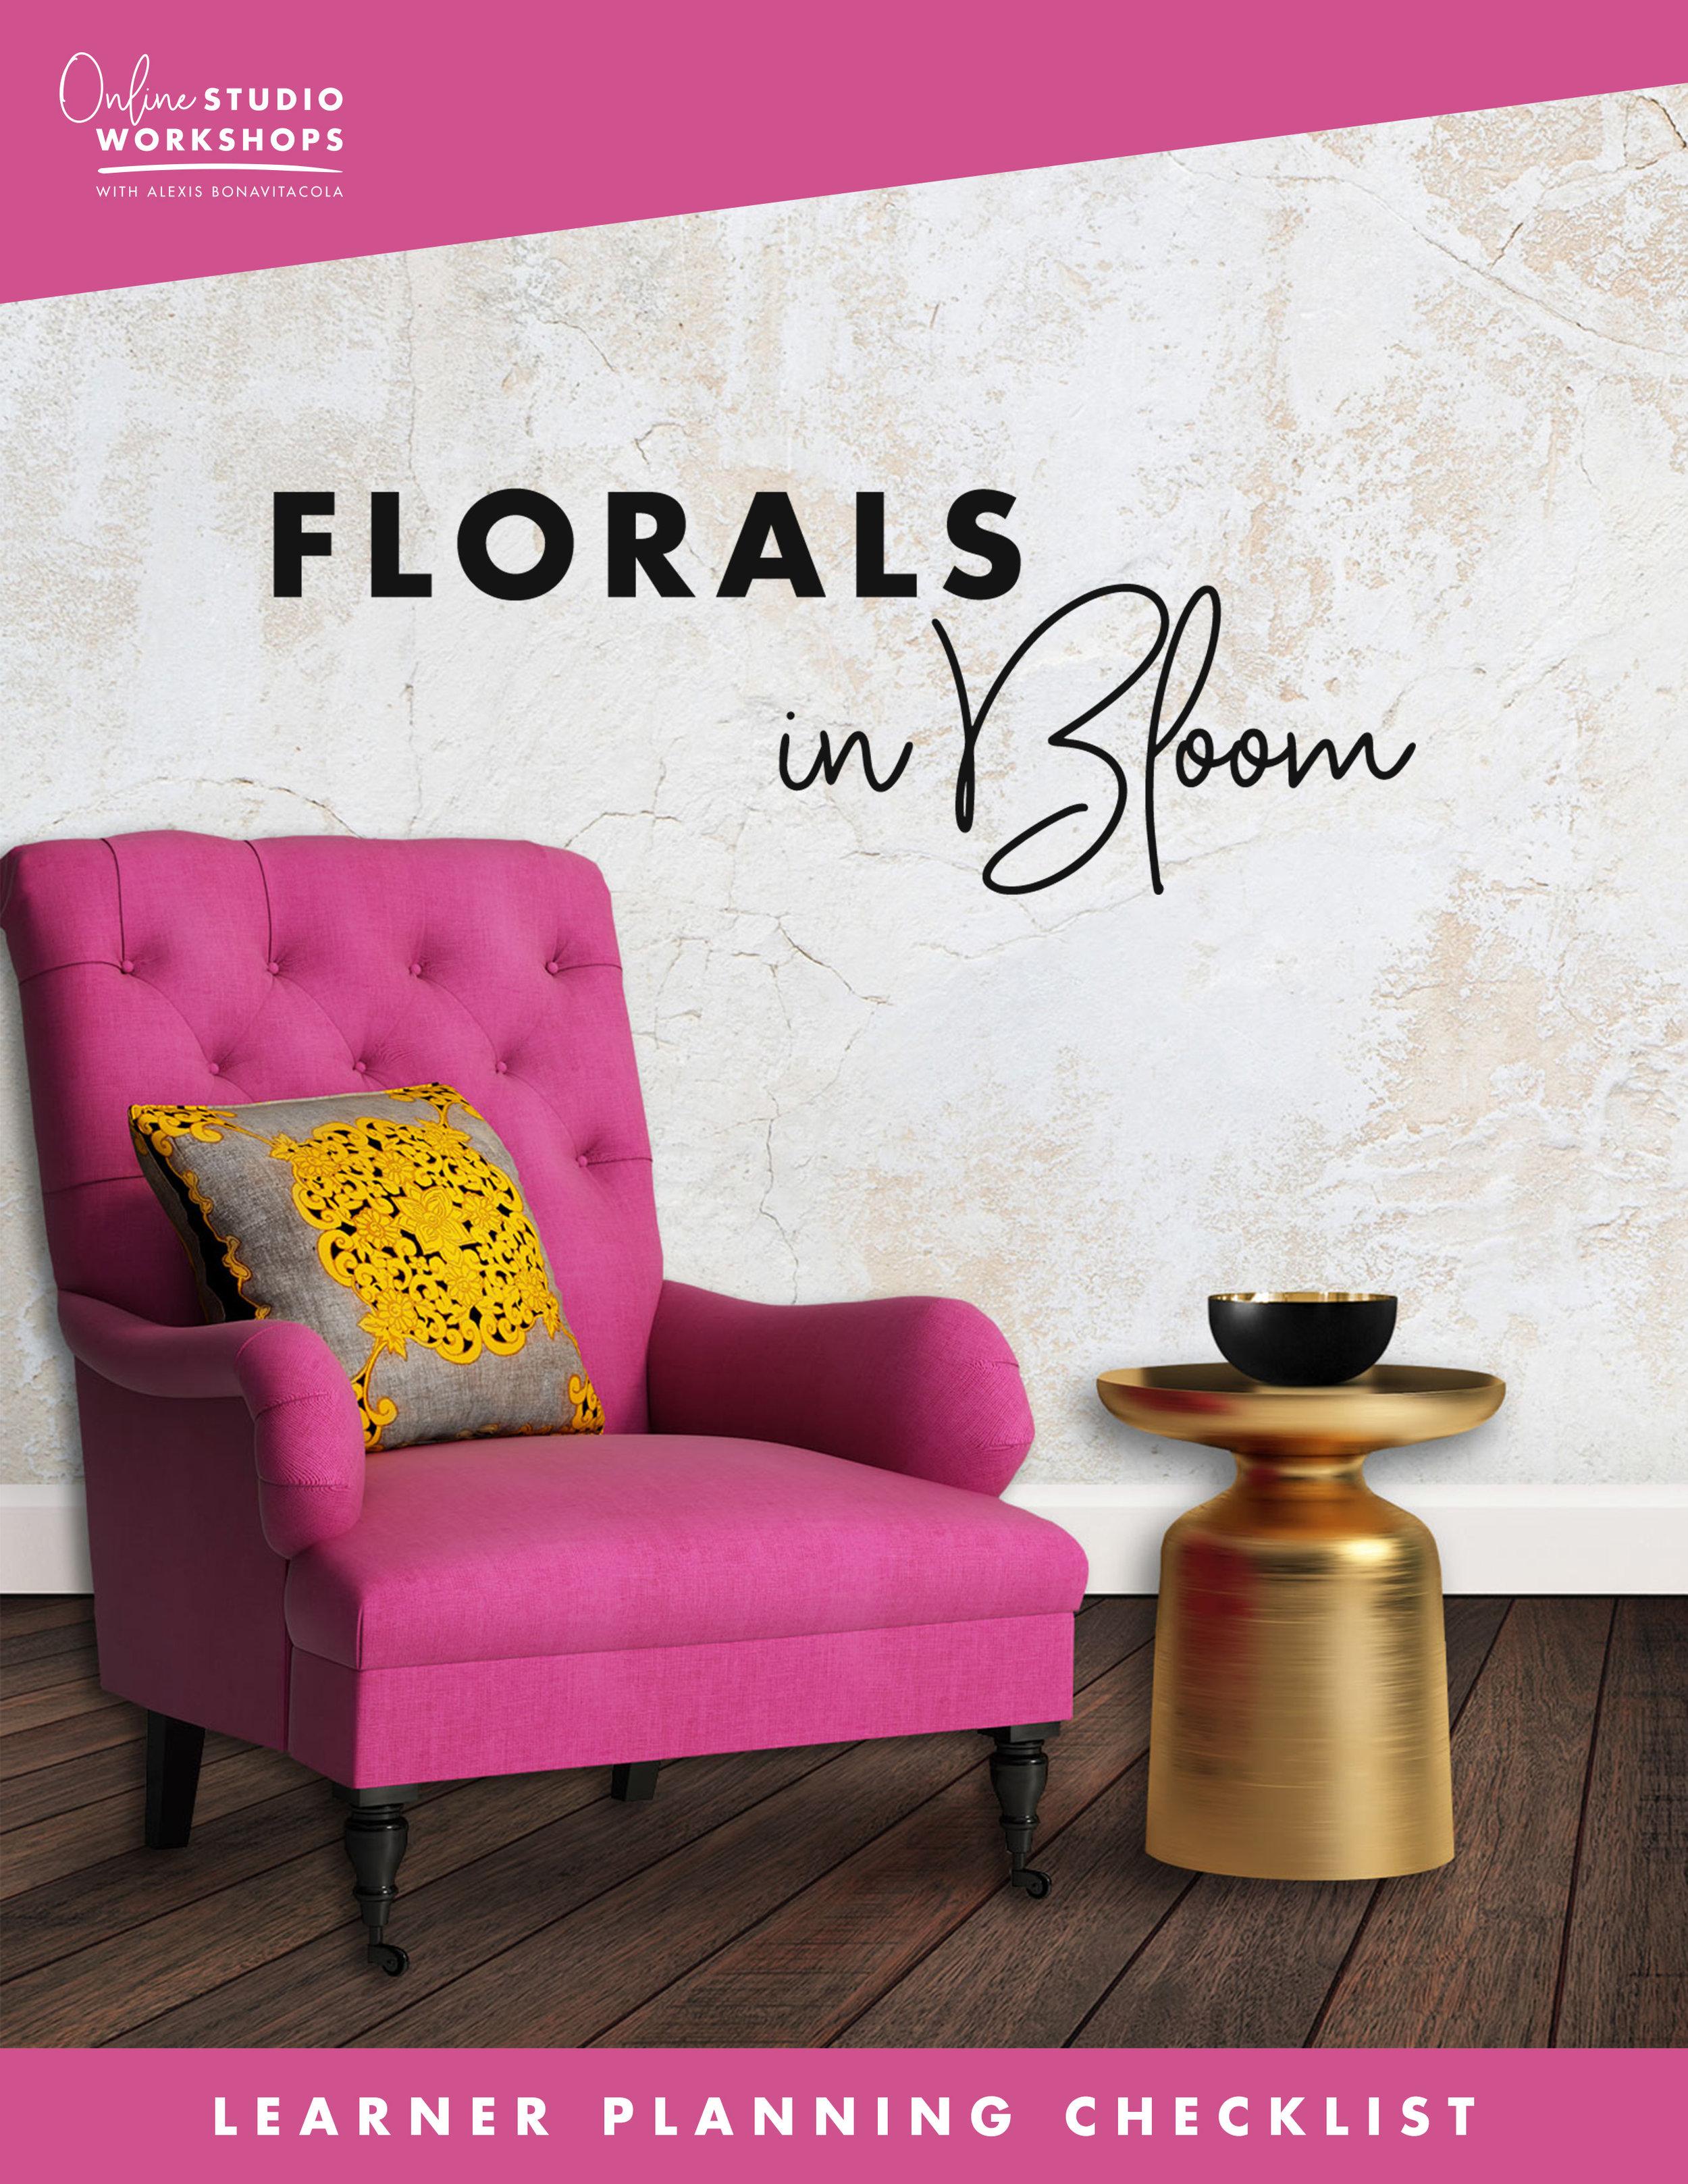 AB_OSW_FloralsInBloom_LearnerPlanningChecklist_Cover.jpg